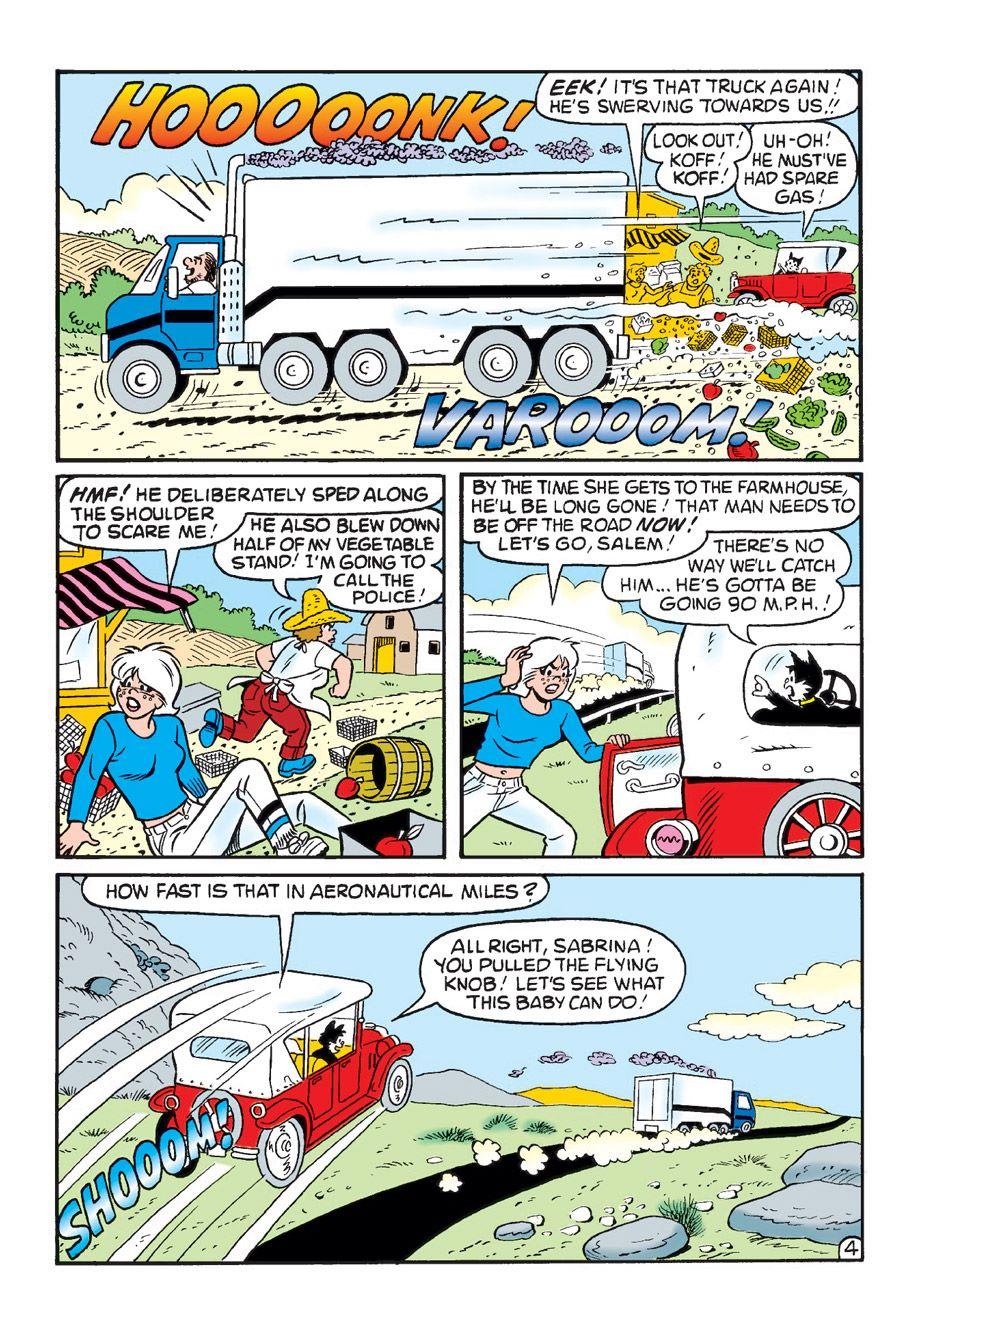 BettyAndVeronicaJumboComicsDigest_293-50 ComicList Previews: BETTY AND VERONICA JUMBO COMICS DIGEST #293